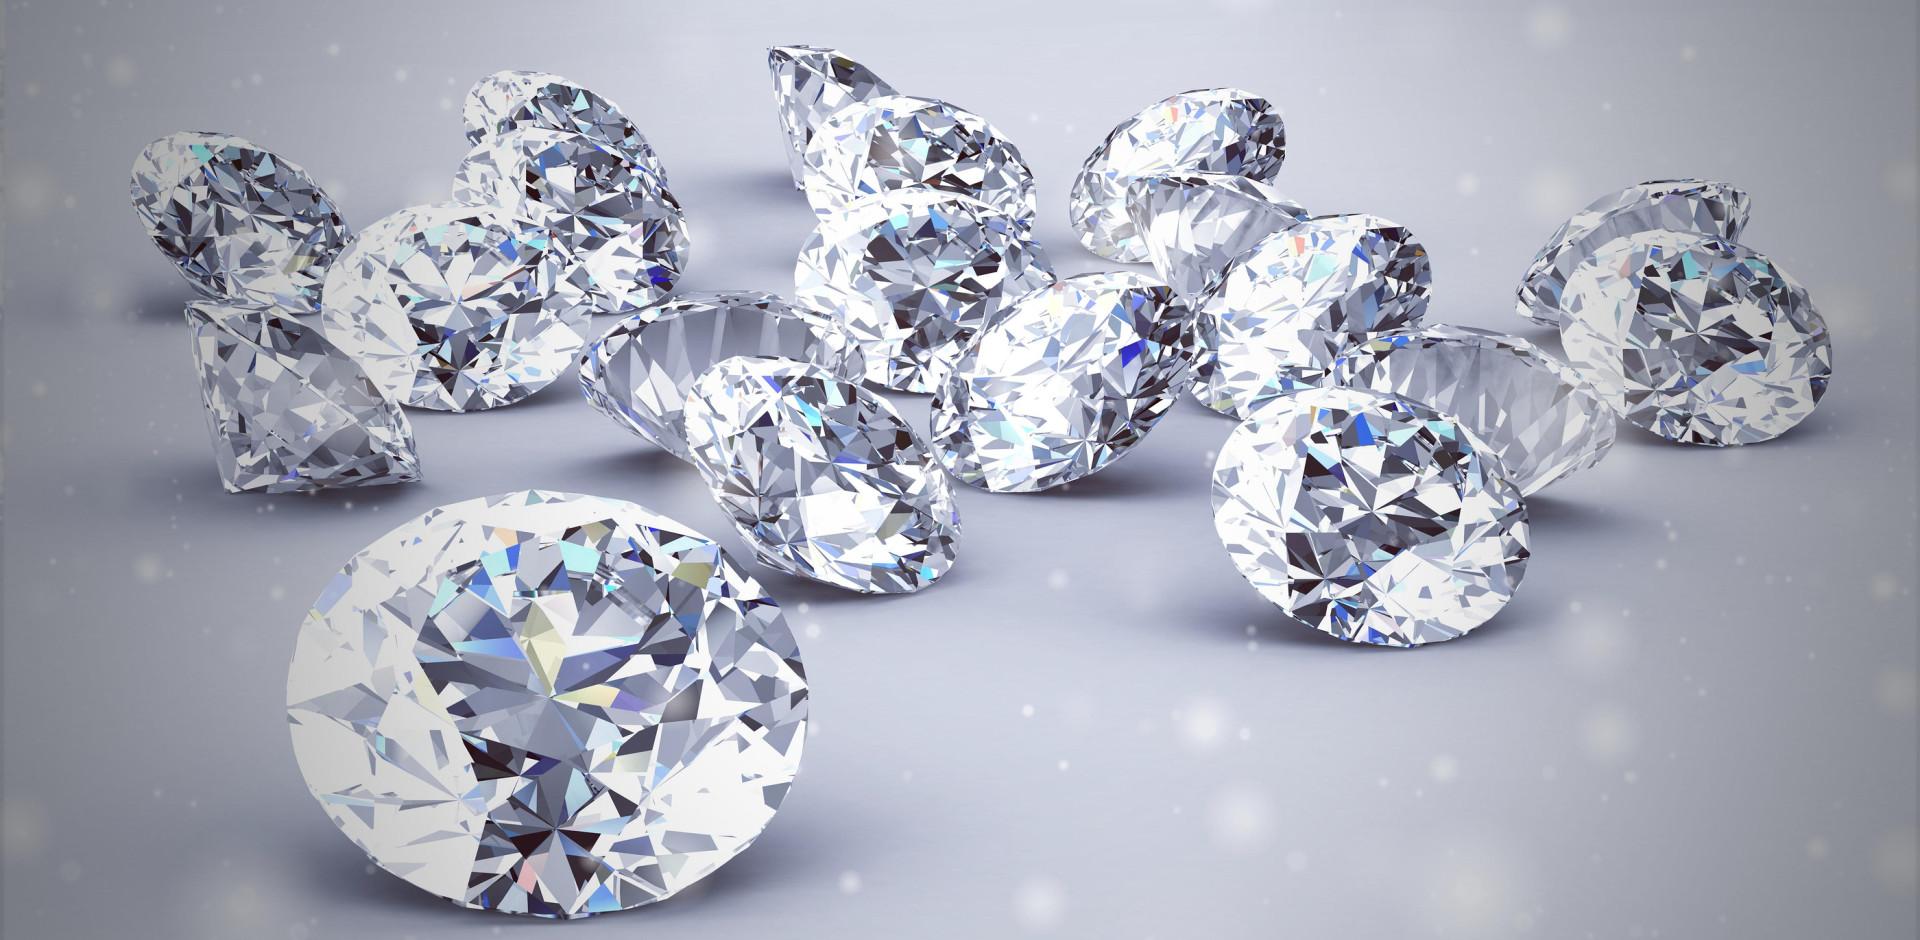 Diamond jewels representing luxury brands in native advertising